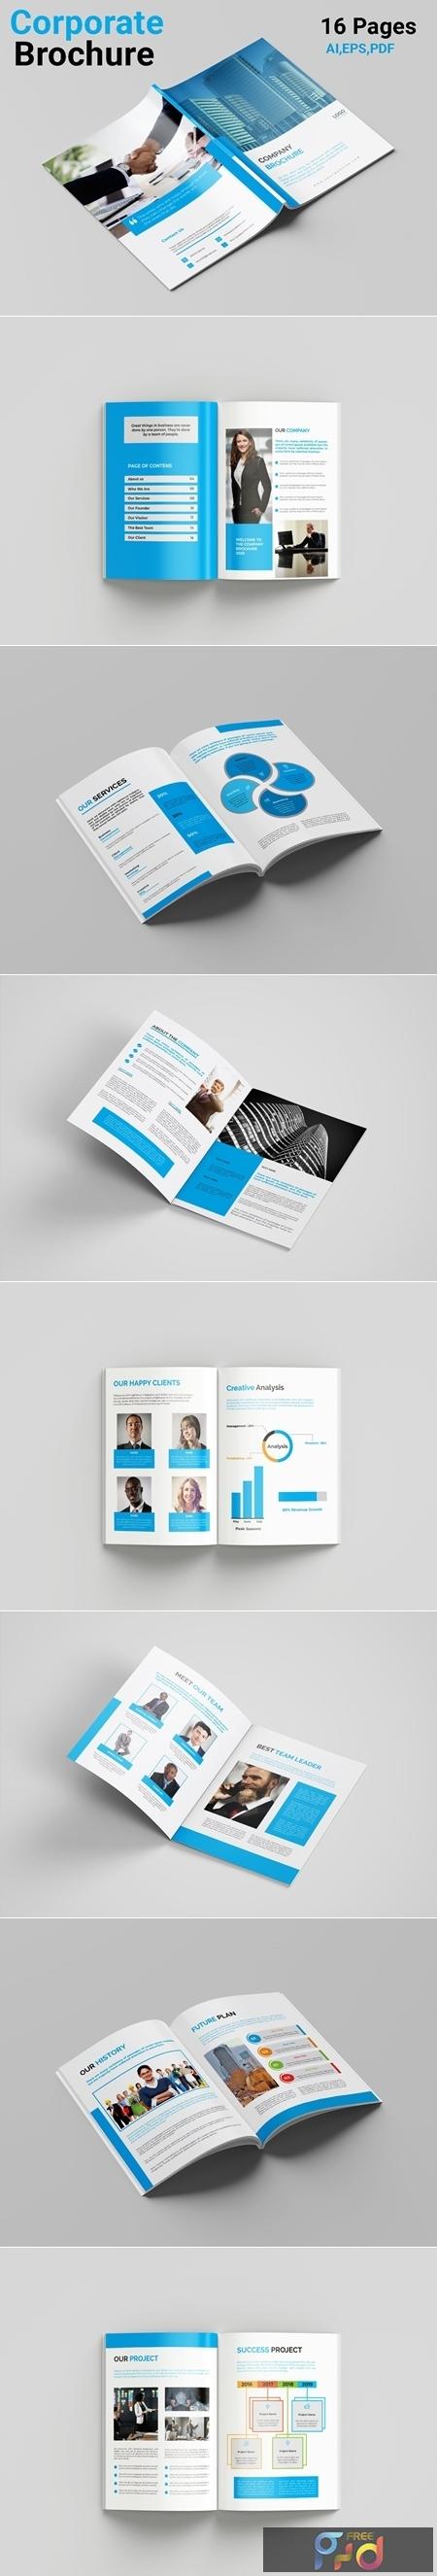 Corporate Brochure 4462699 1